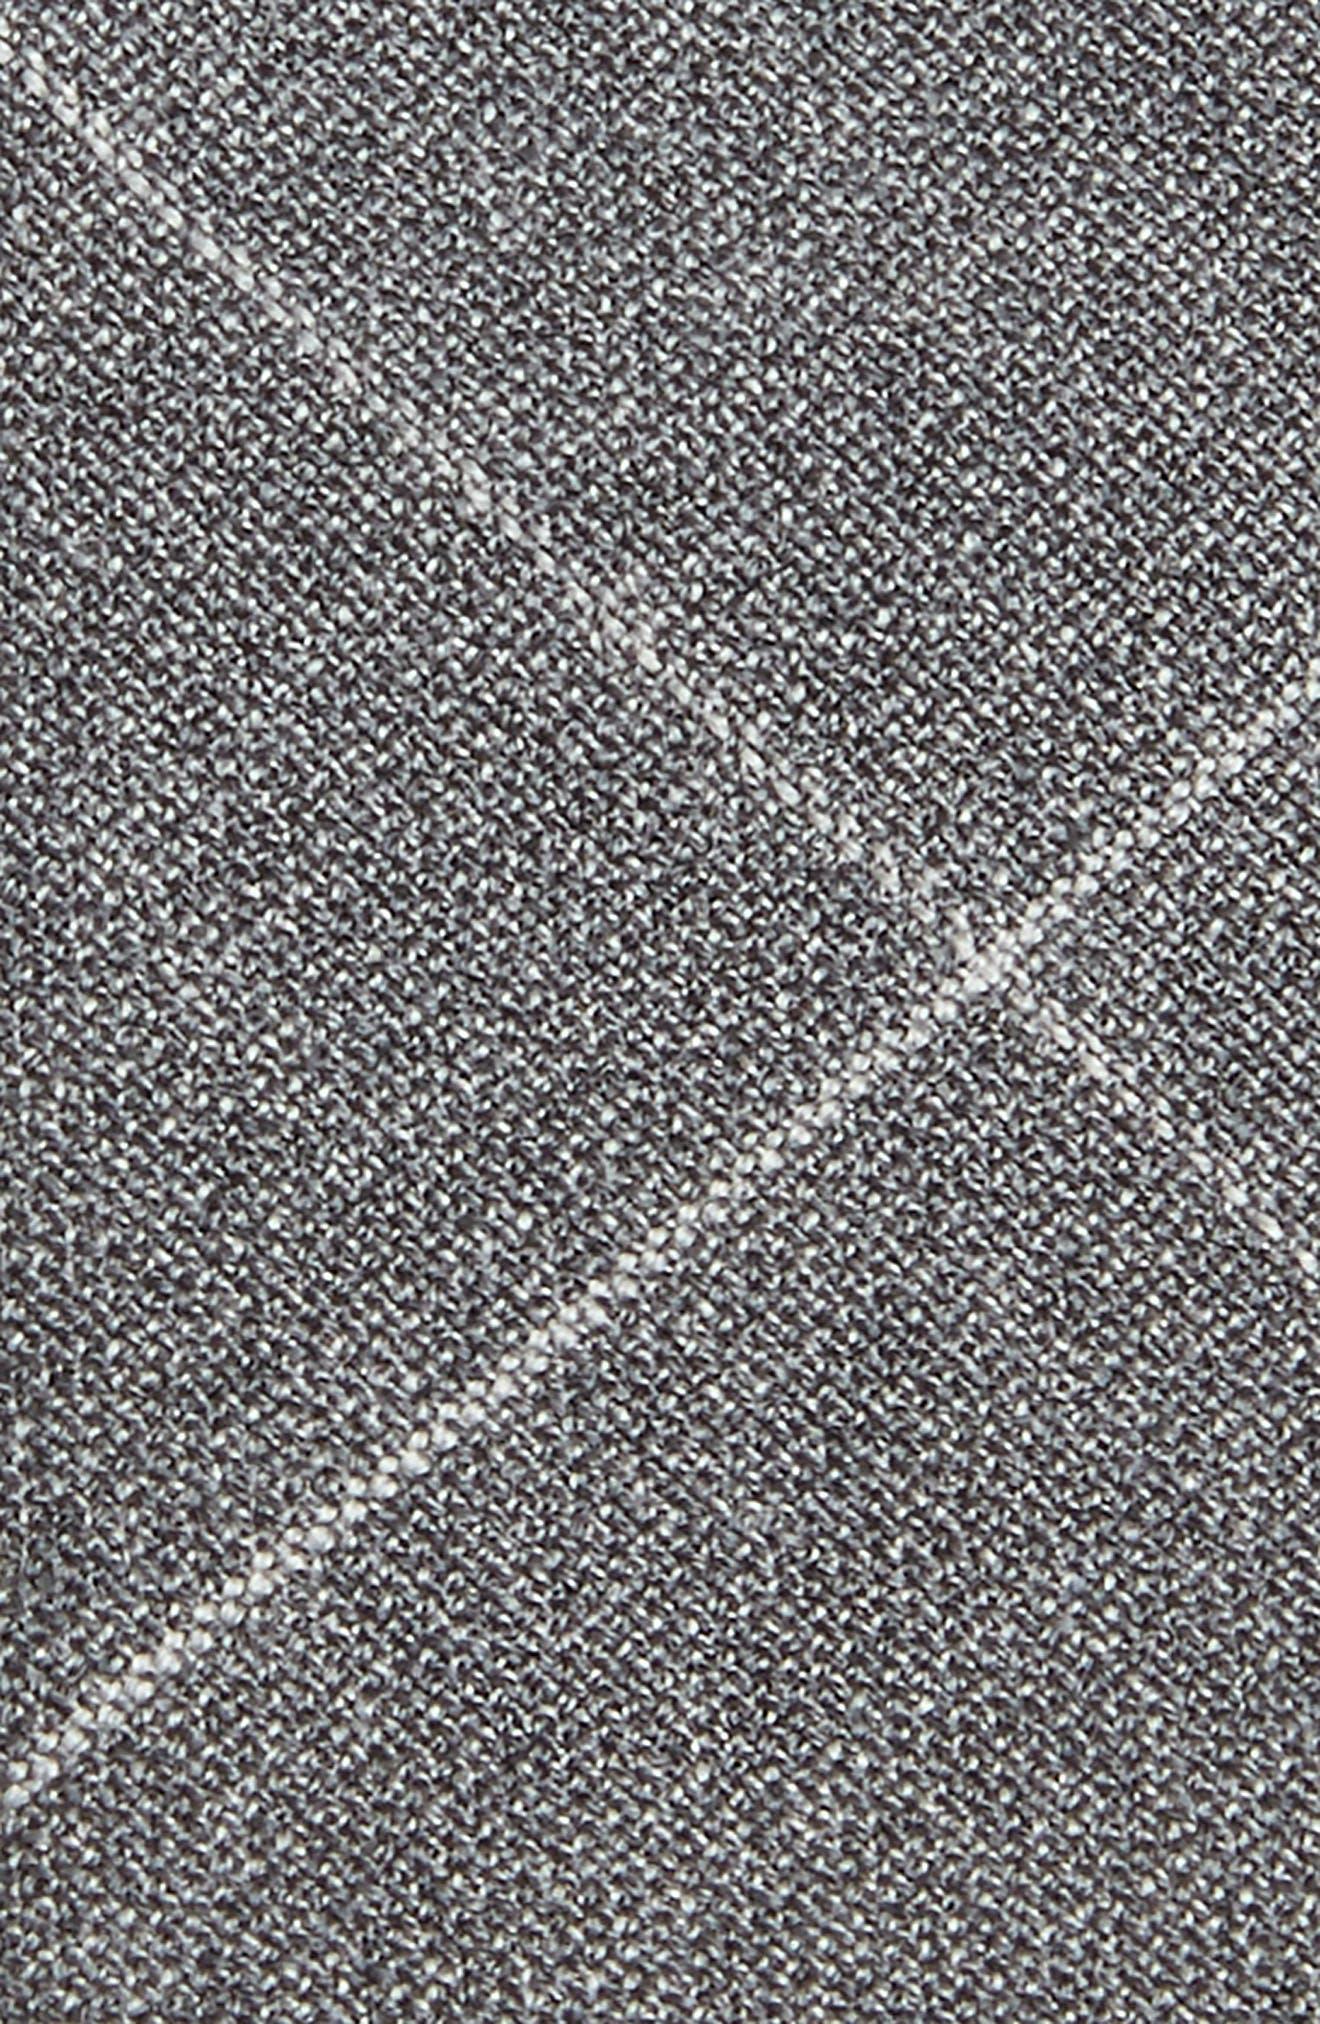 Windowpane Wool Skinny Tie,                             Alternate thumbnail 2, color,                             LIGHT GREY